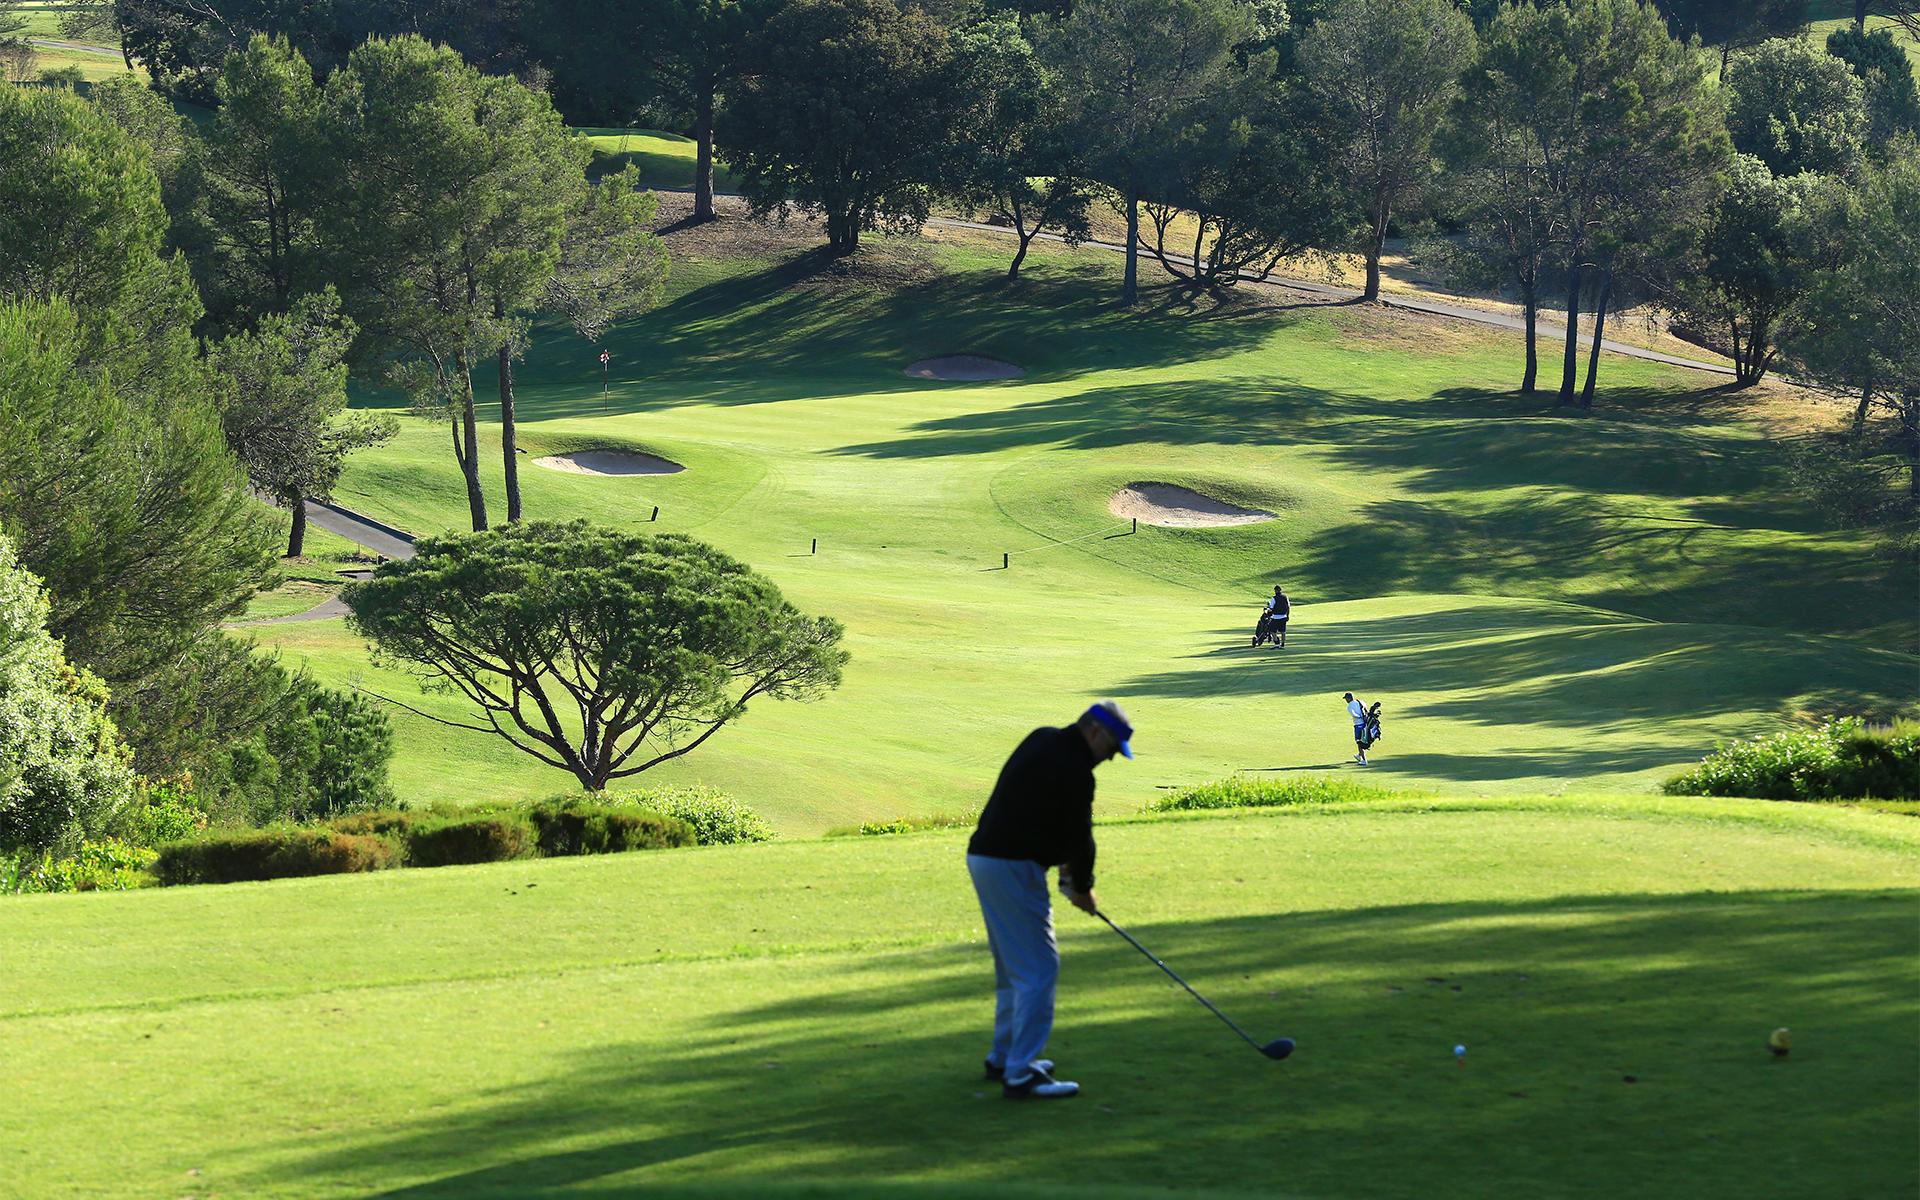 golf-expedition-golf-reizen-frankrijk-regio-cote-d'azur-Les-Domaines-de-Saint-Endréol-Golf-en-Spa-Resort-golfers-op-golfbaan